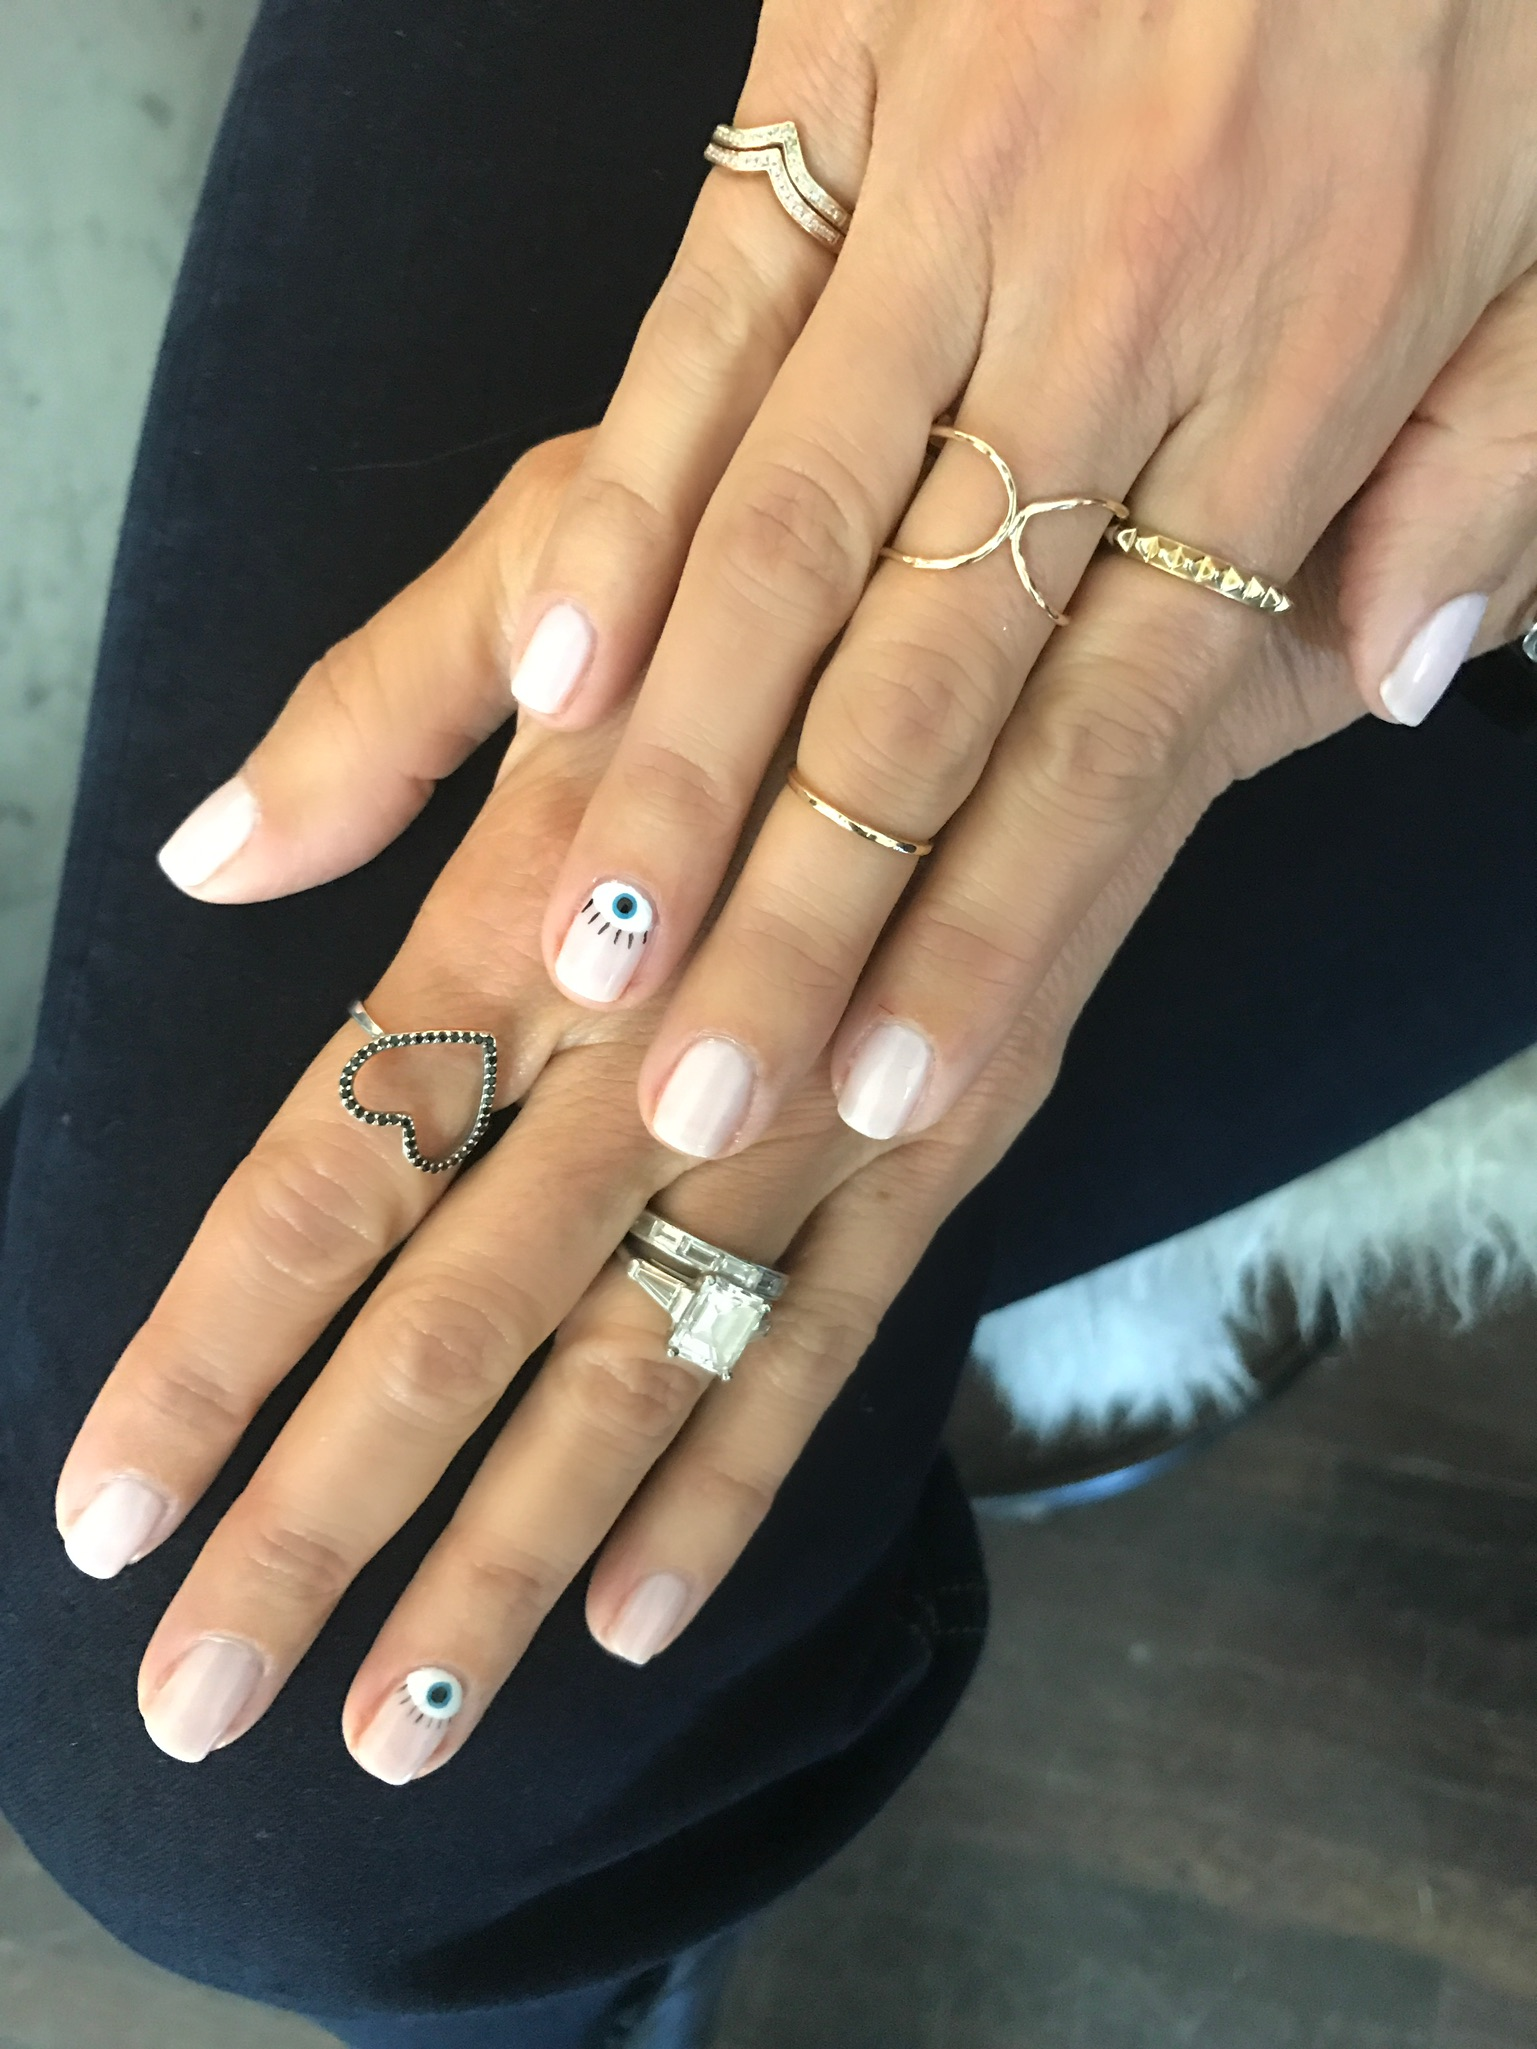 Melissa Meyers + Glamsquad nail art